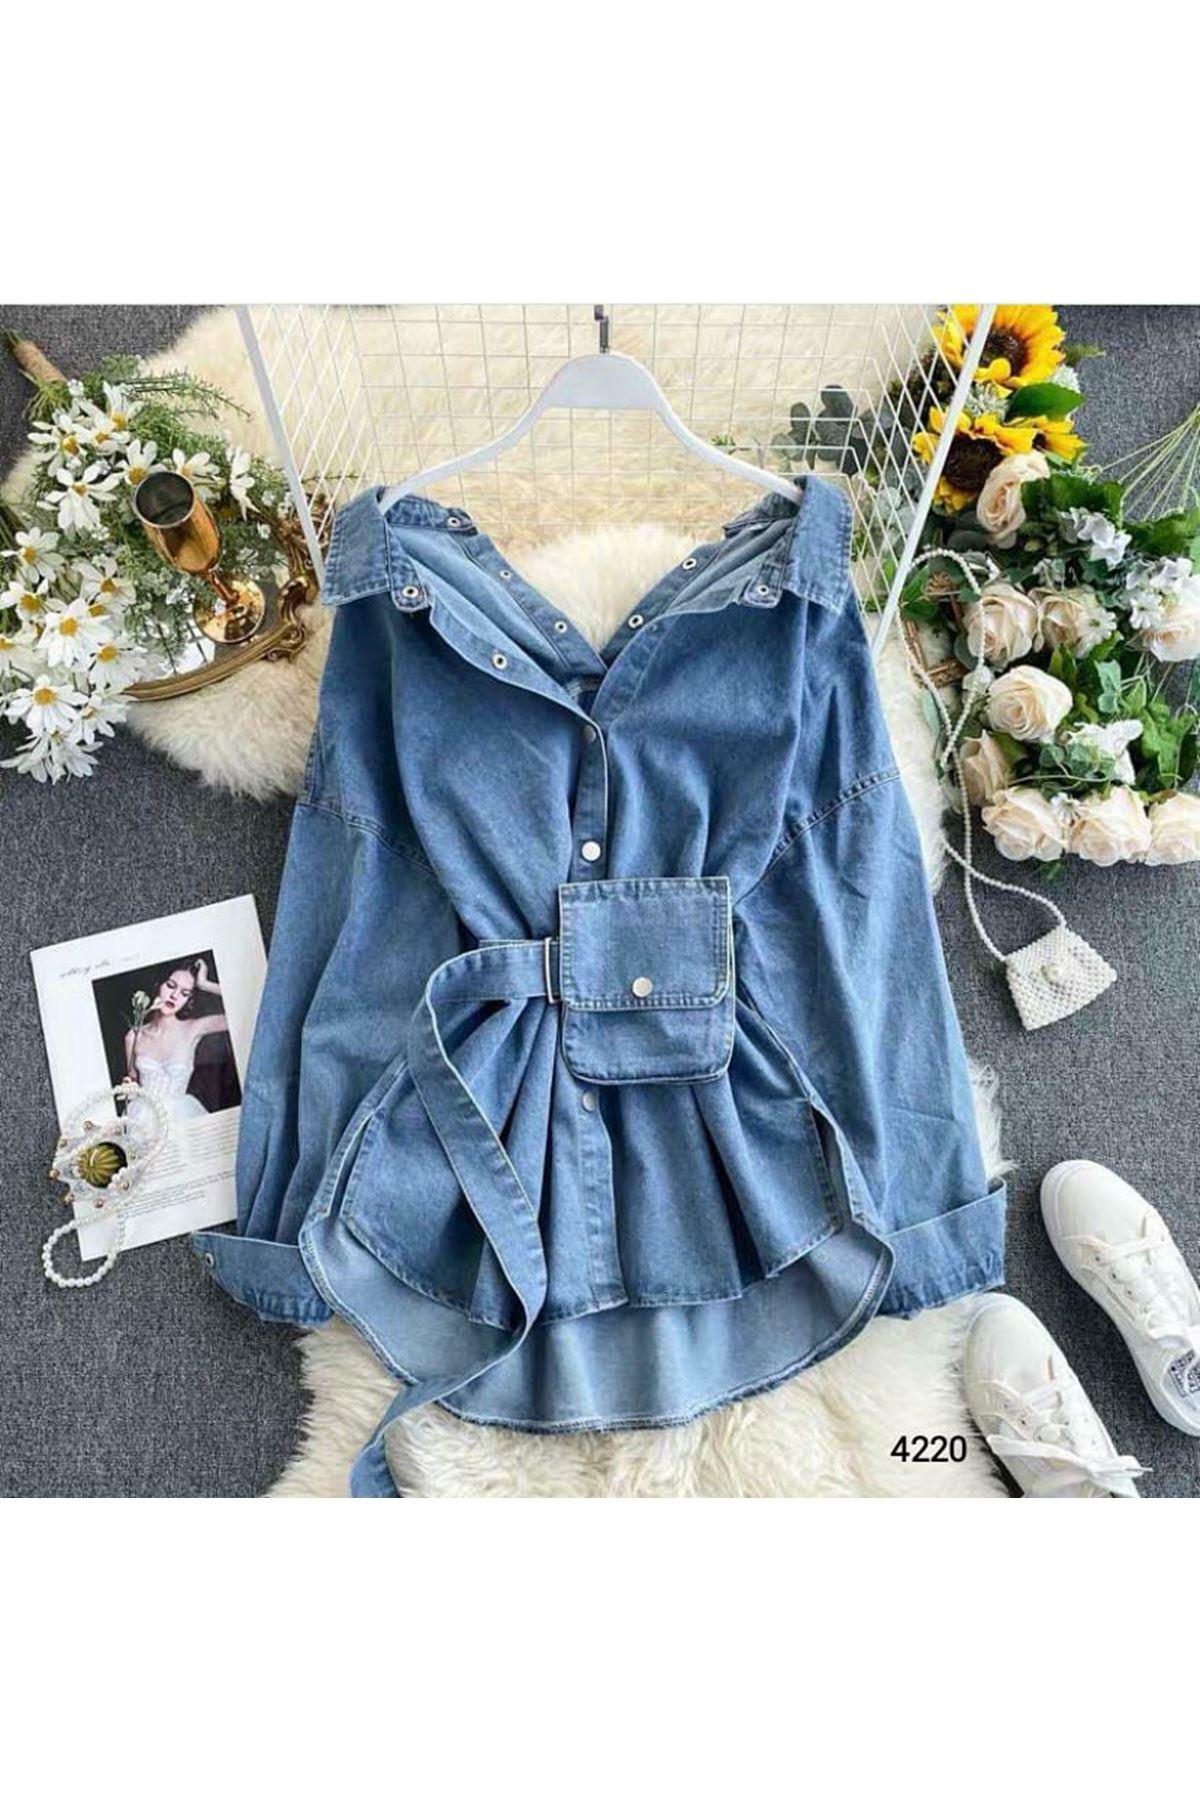 Çanta Kemer Detaylı Kot Ceket Elbise - Mavi